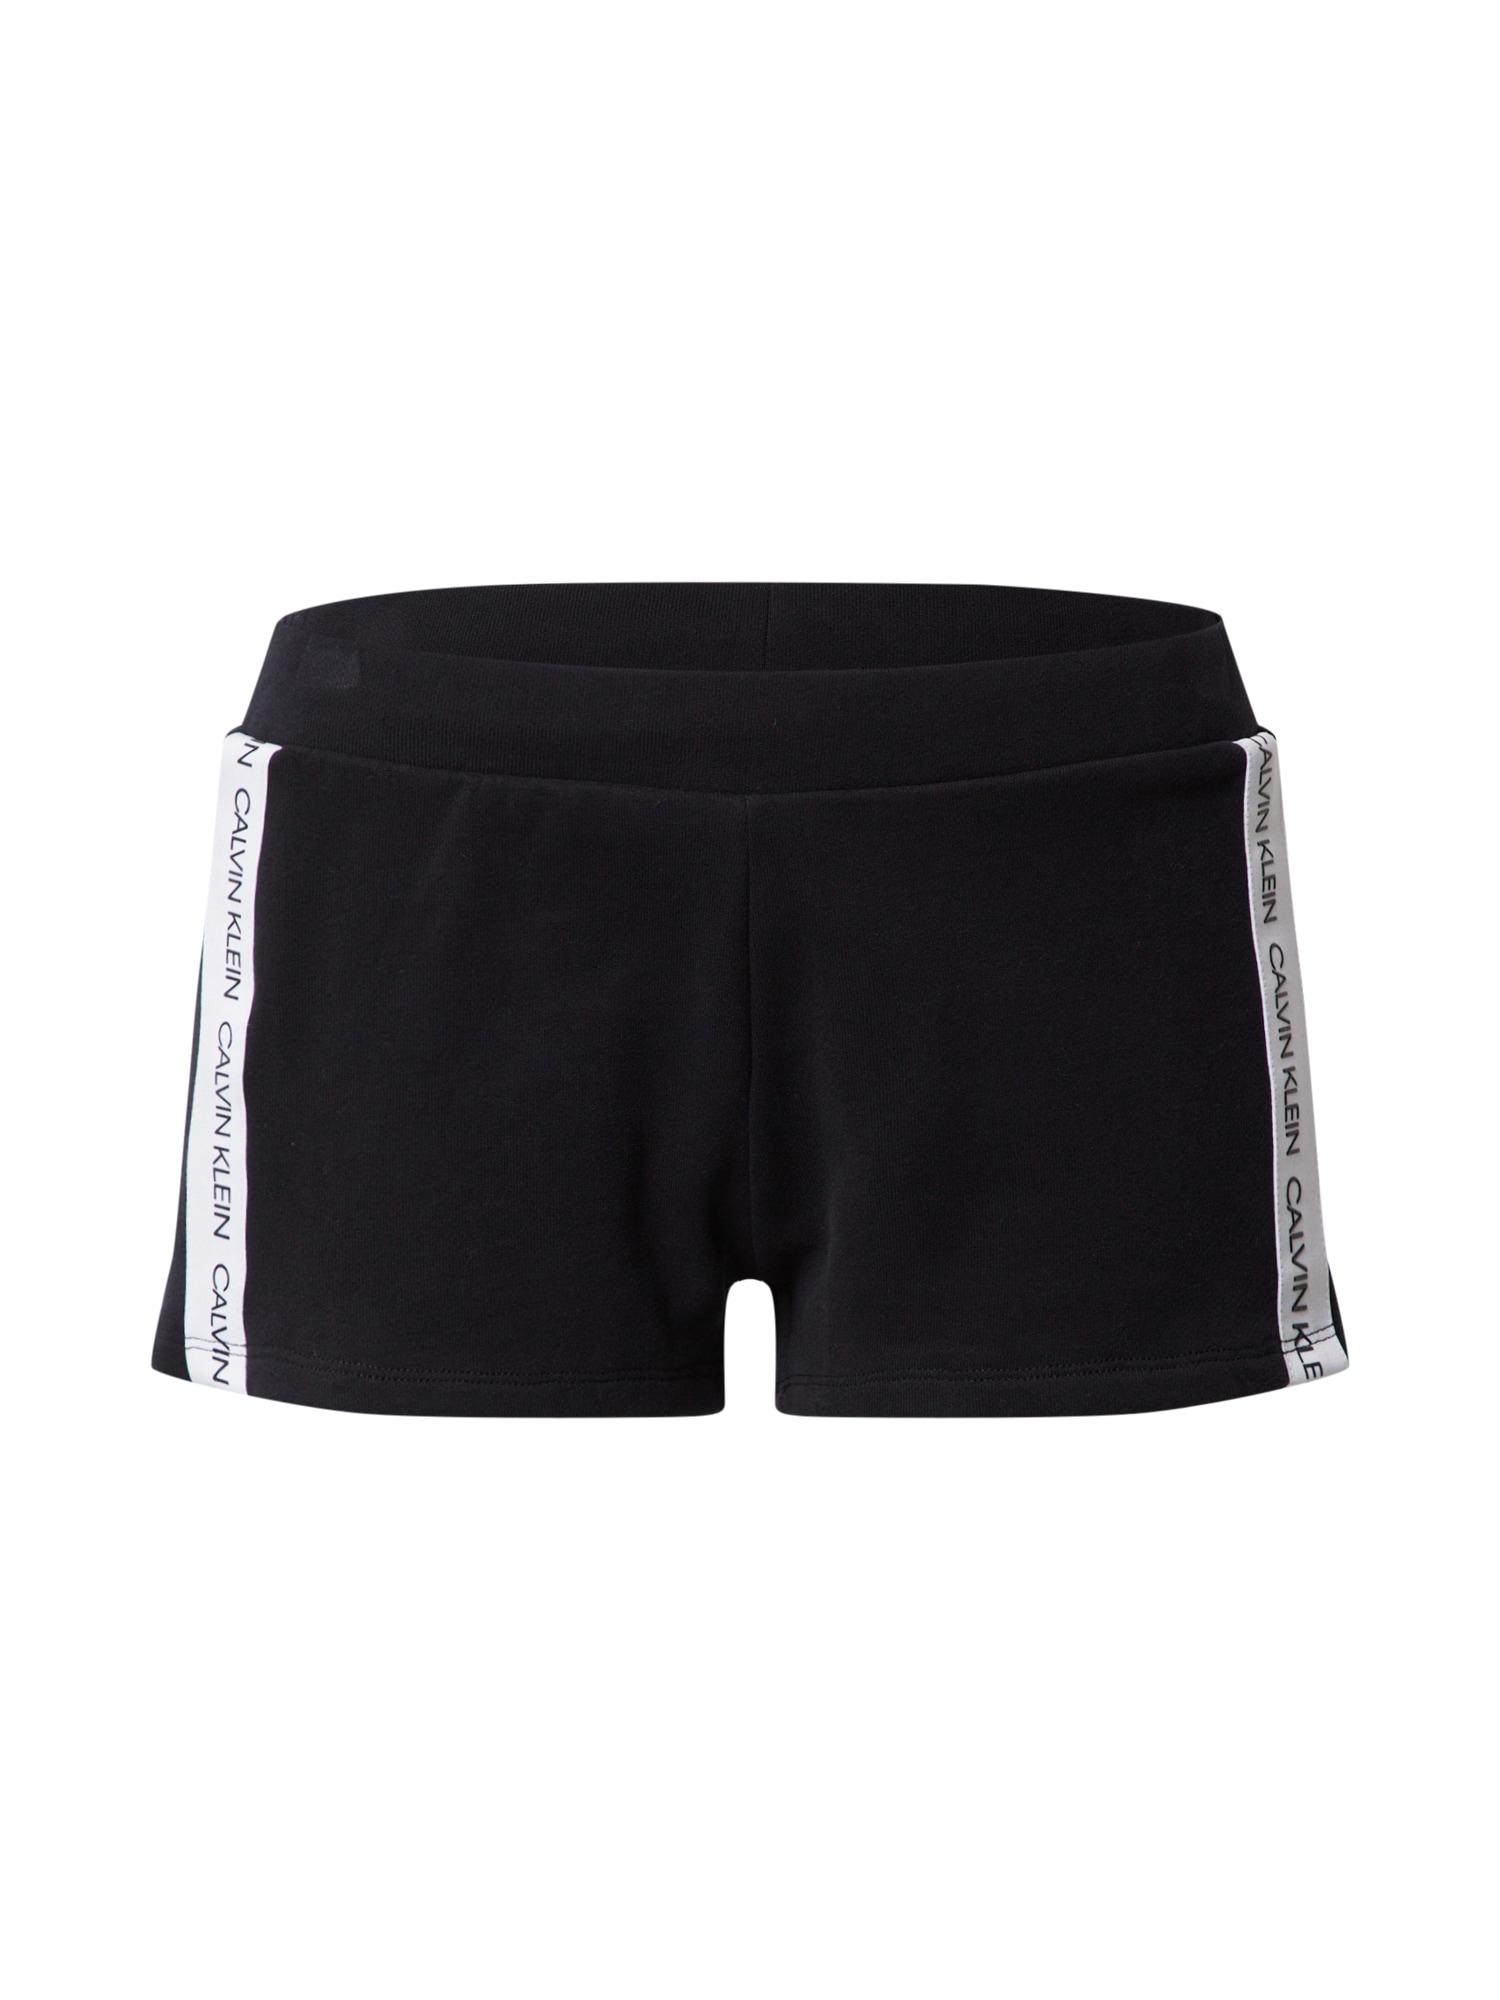 Calvin Klein Underwear Pižaminės kelnės 'W' balta / juoda